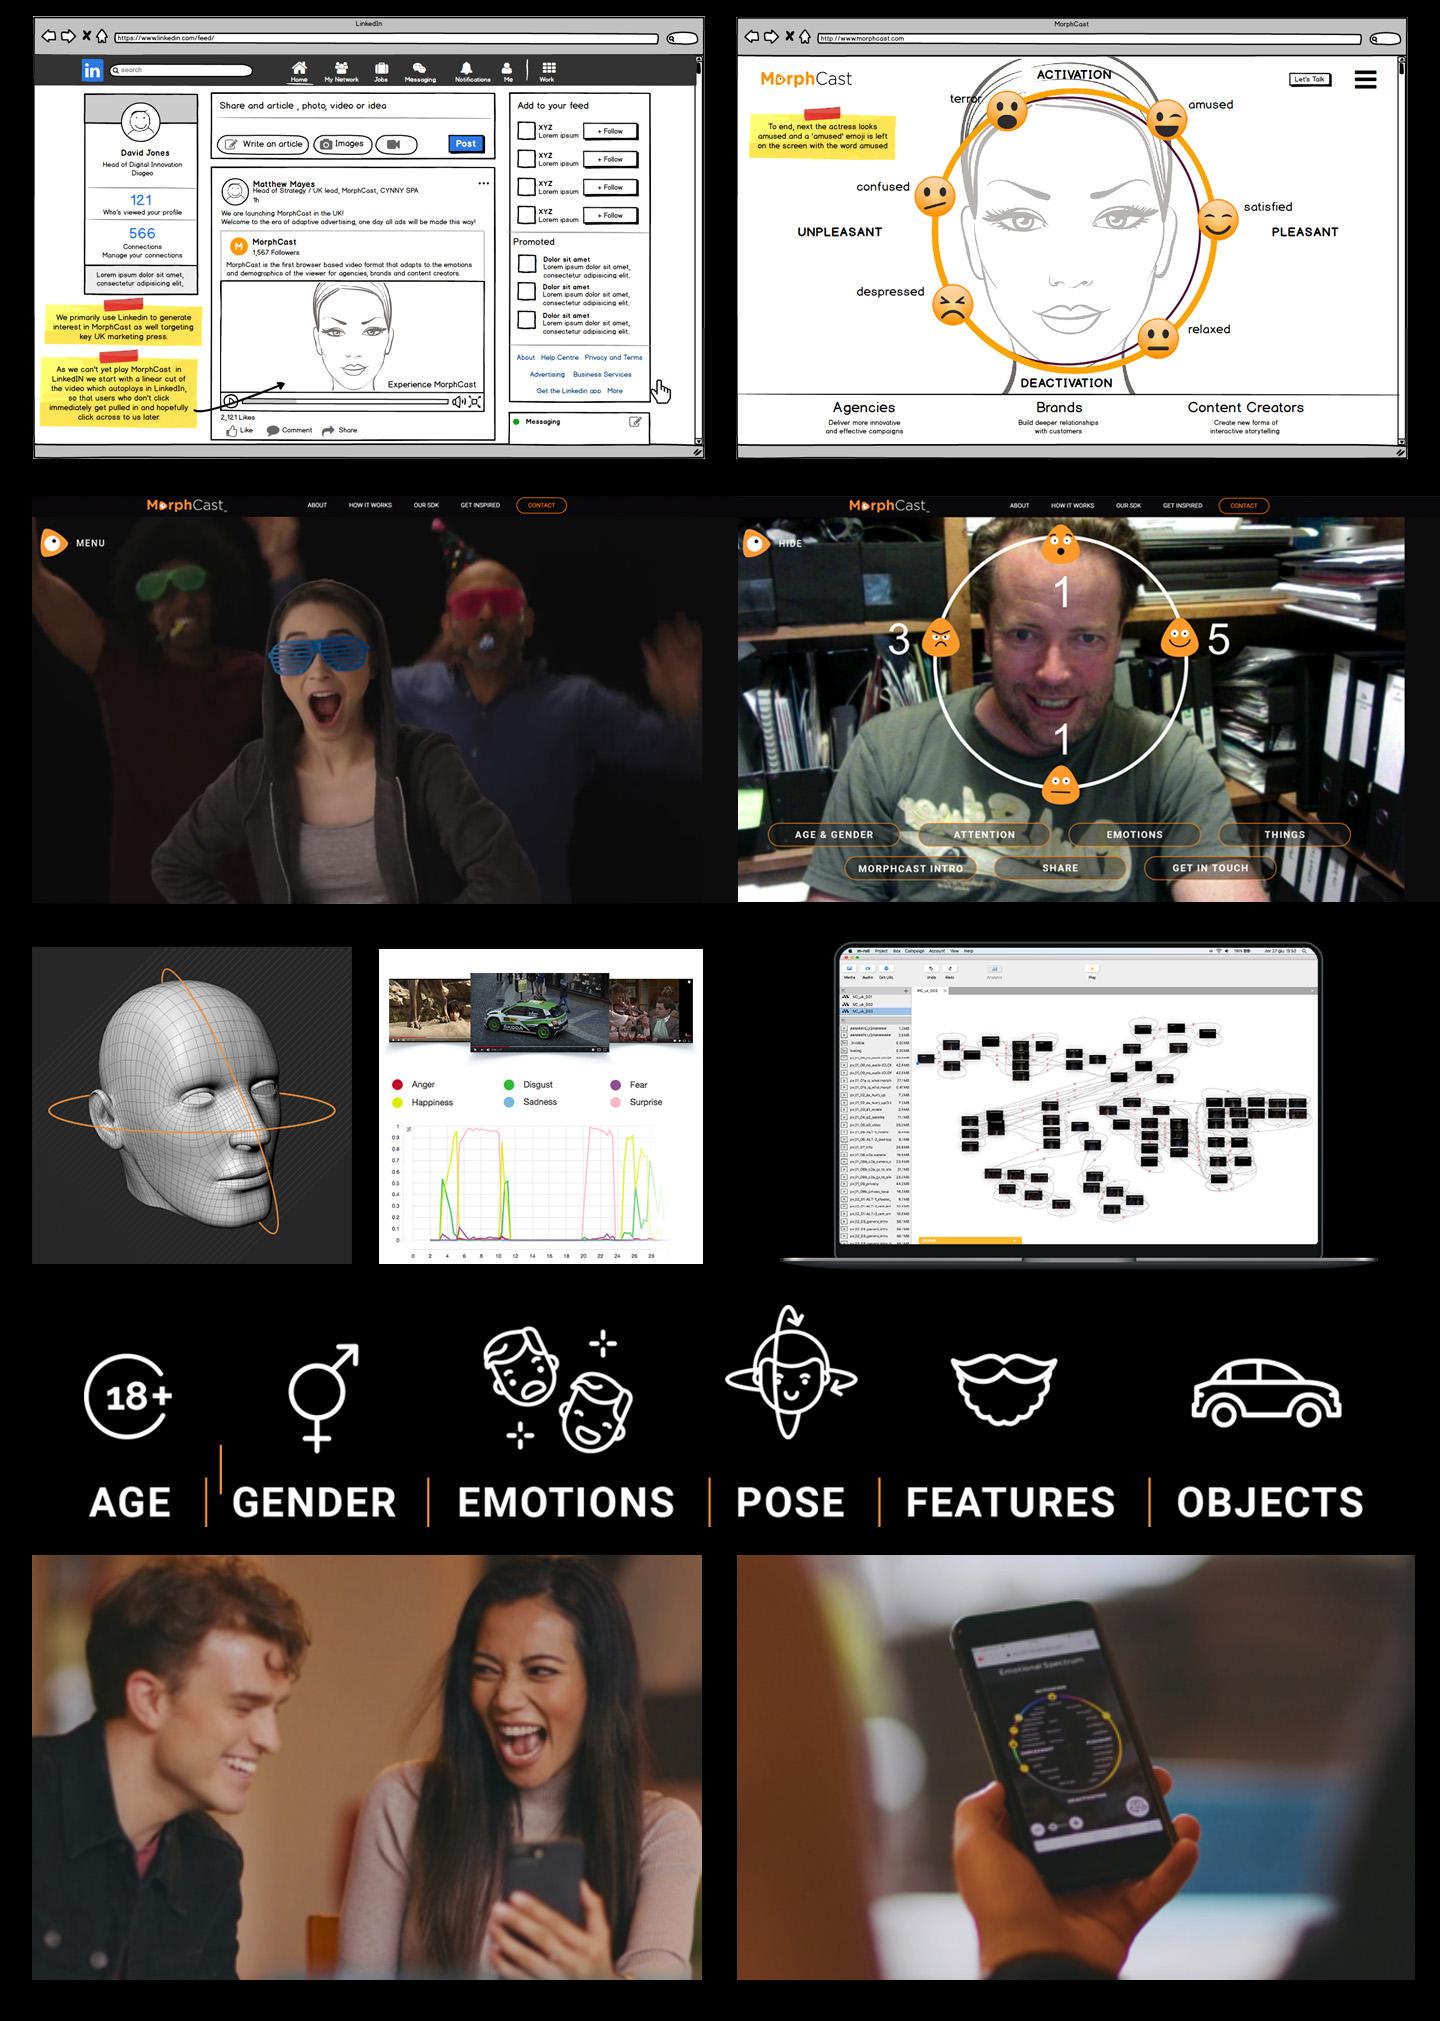 02 - SAP MorphCast Project